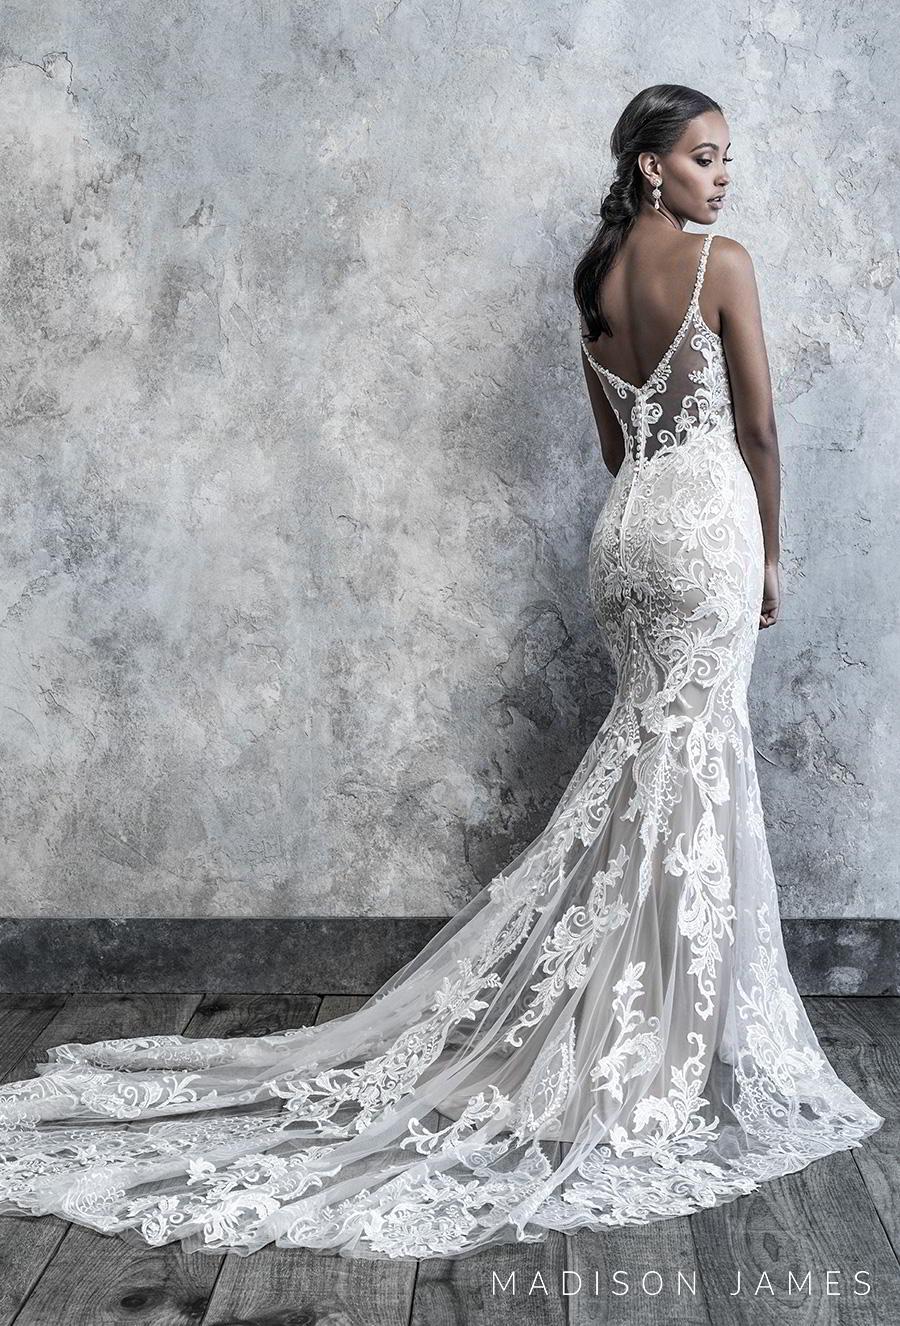 madison james 2019 bridal sleeveless thin strap diamond neck full embellishment elegant drop waist a line wedding dress v back chapel train (520) bv